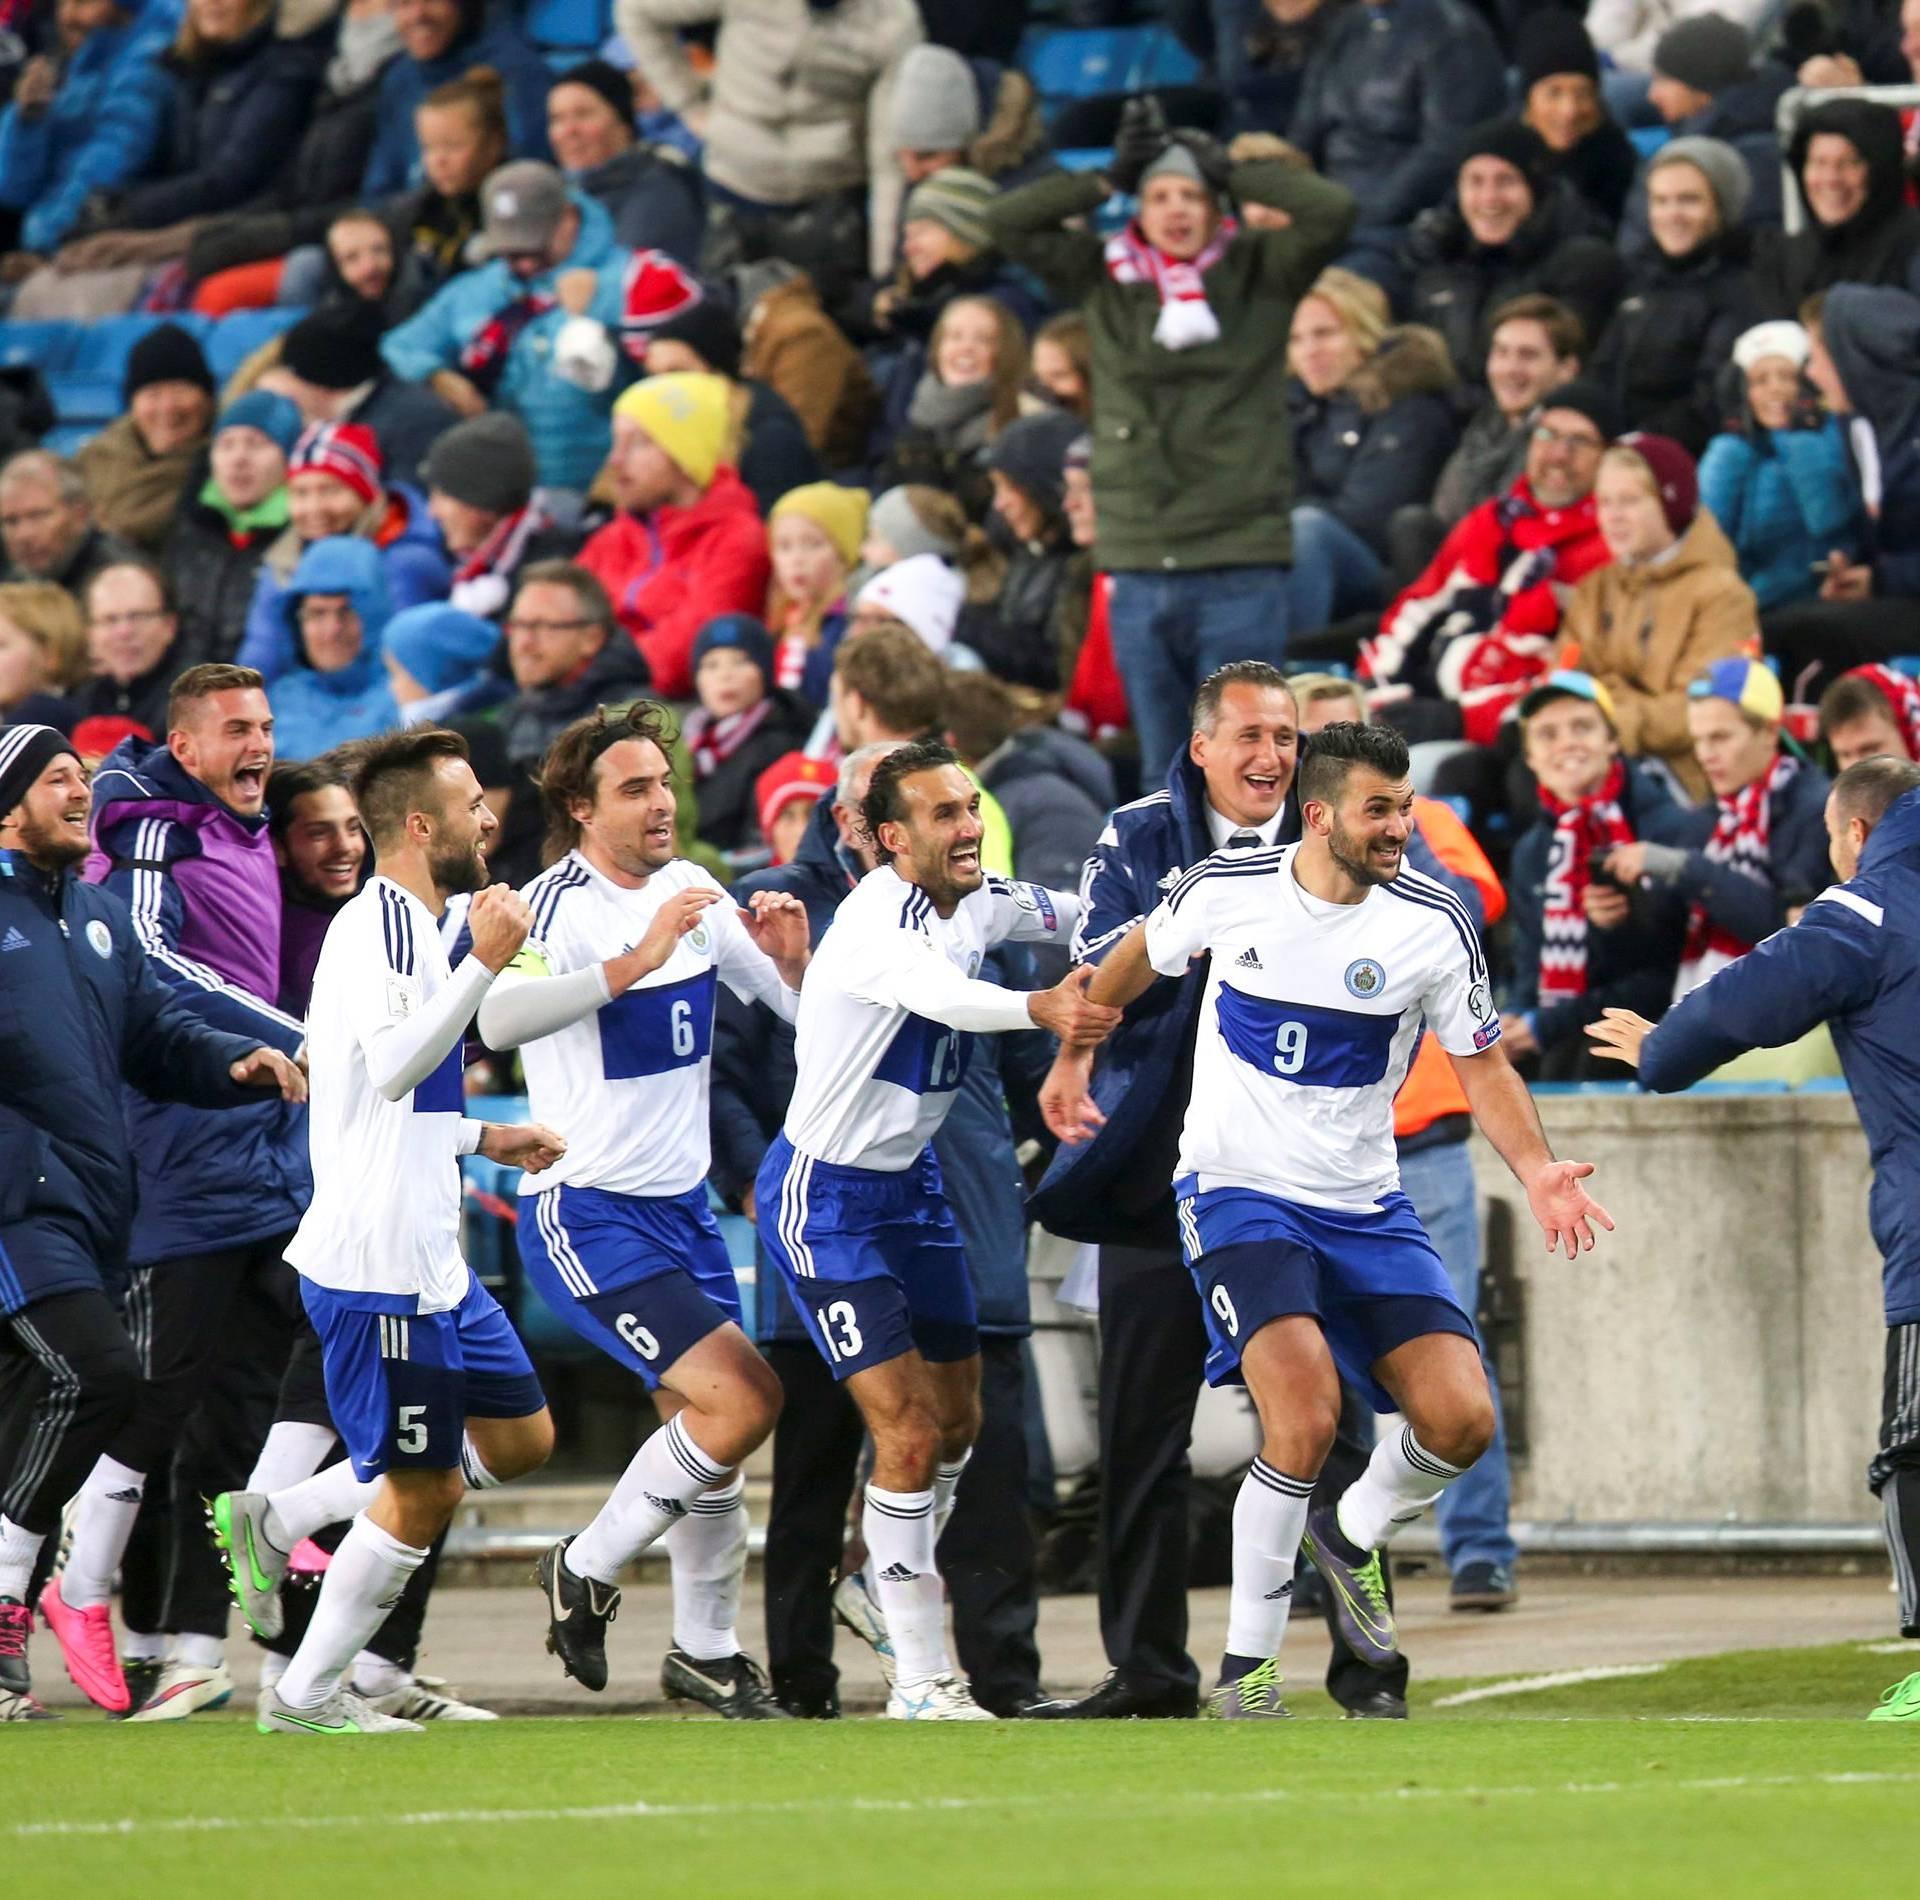 Football Soccer - Norway v San Marino - 2018 World Cup Qualifier